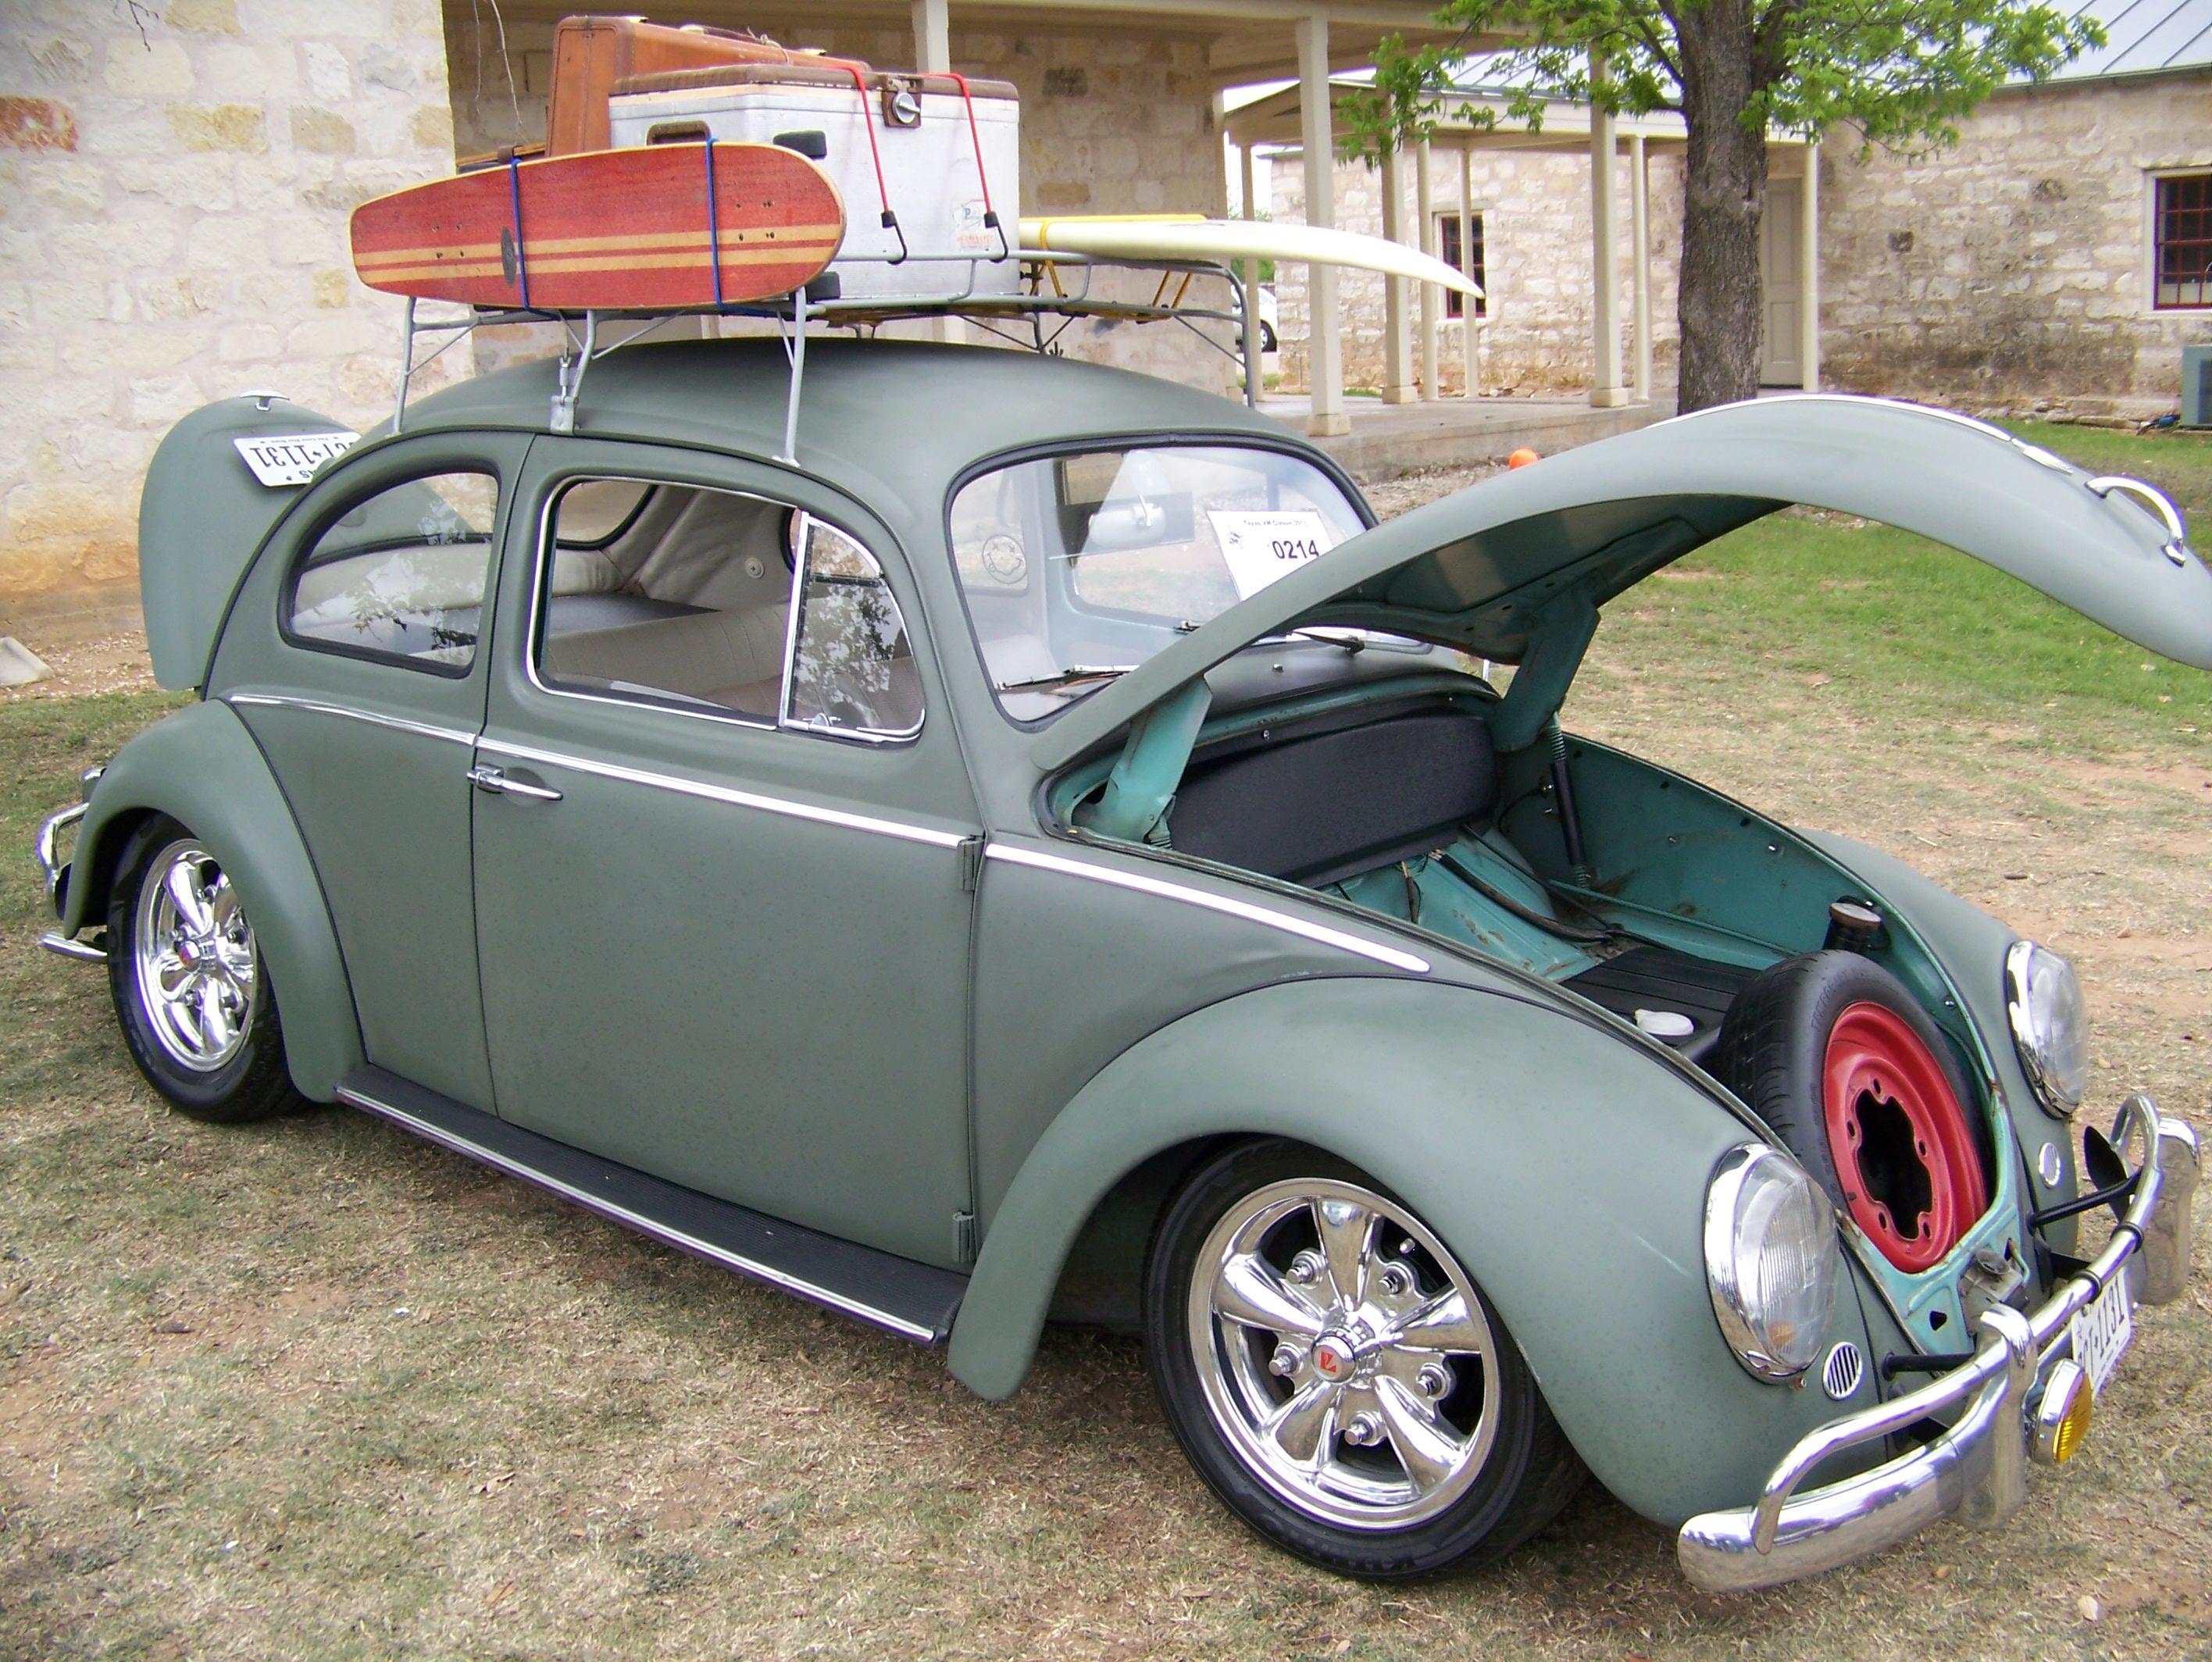 0214 Texas Vw Classic